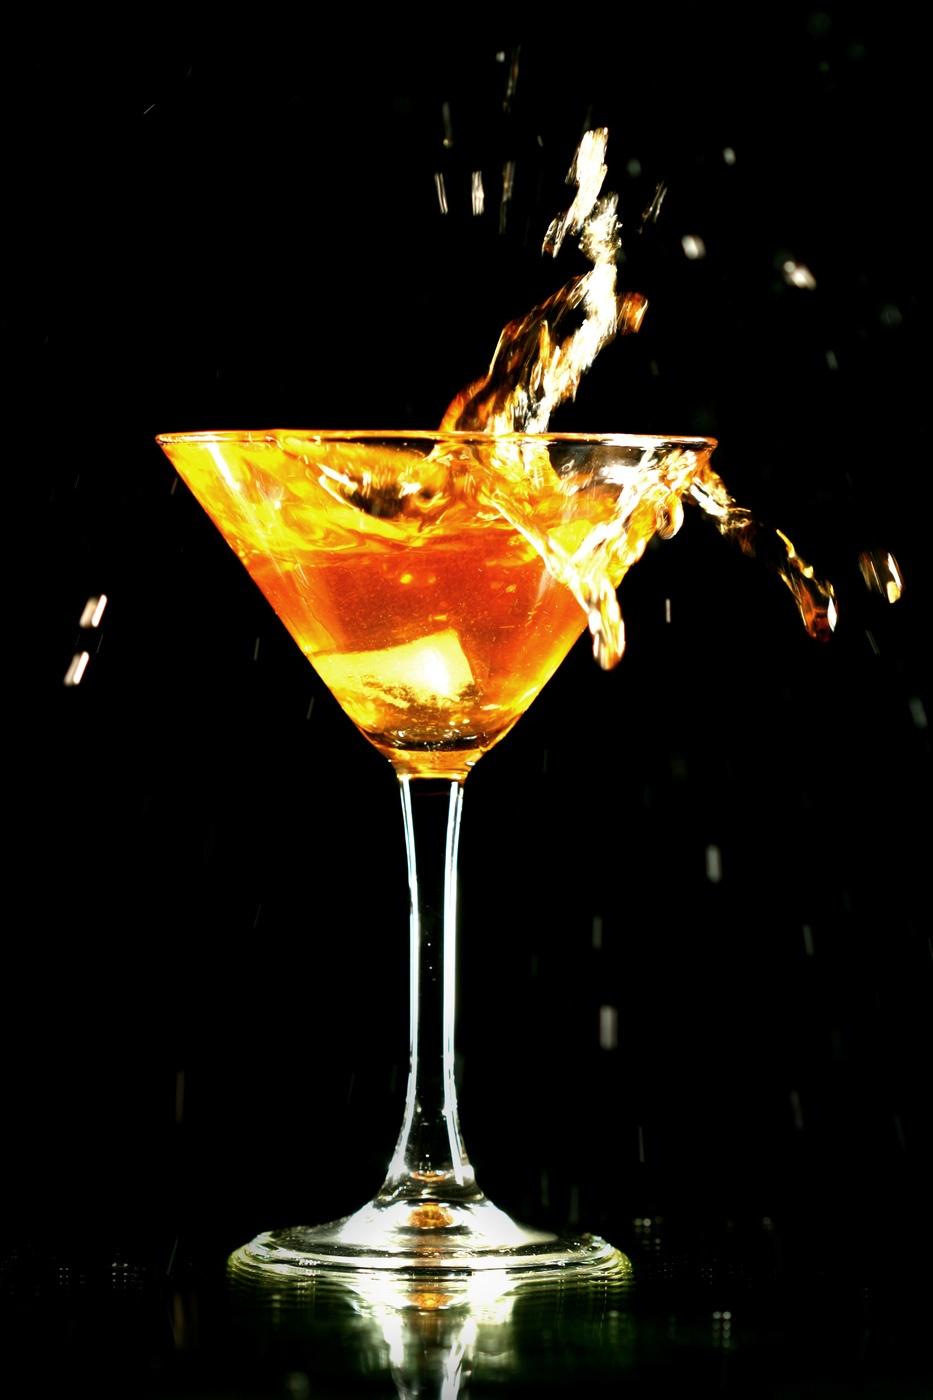 Splashing fruity cocktail in martini glass